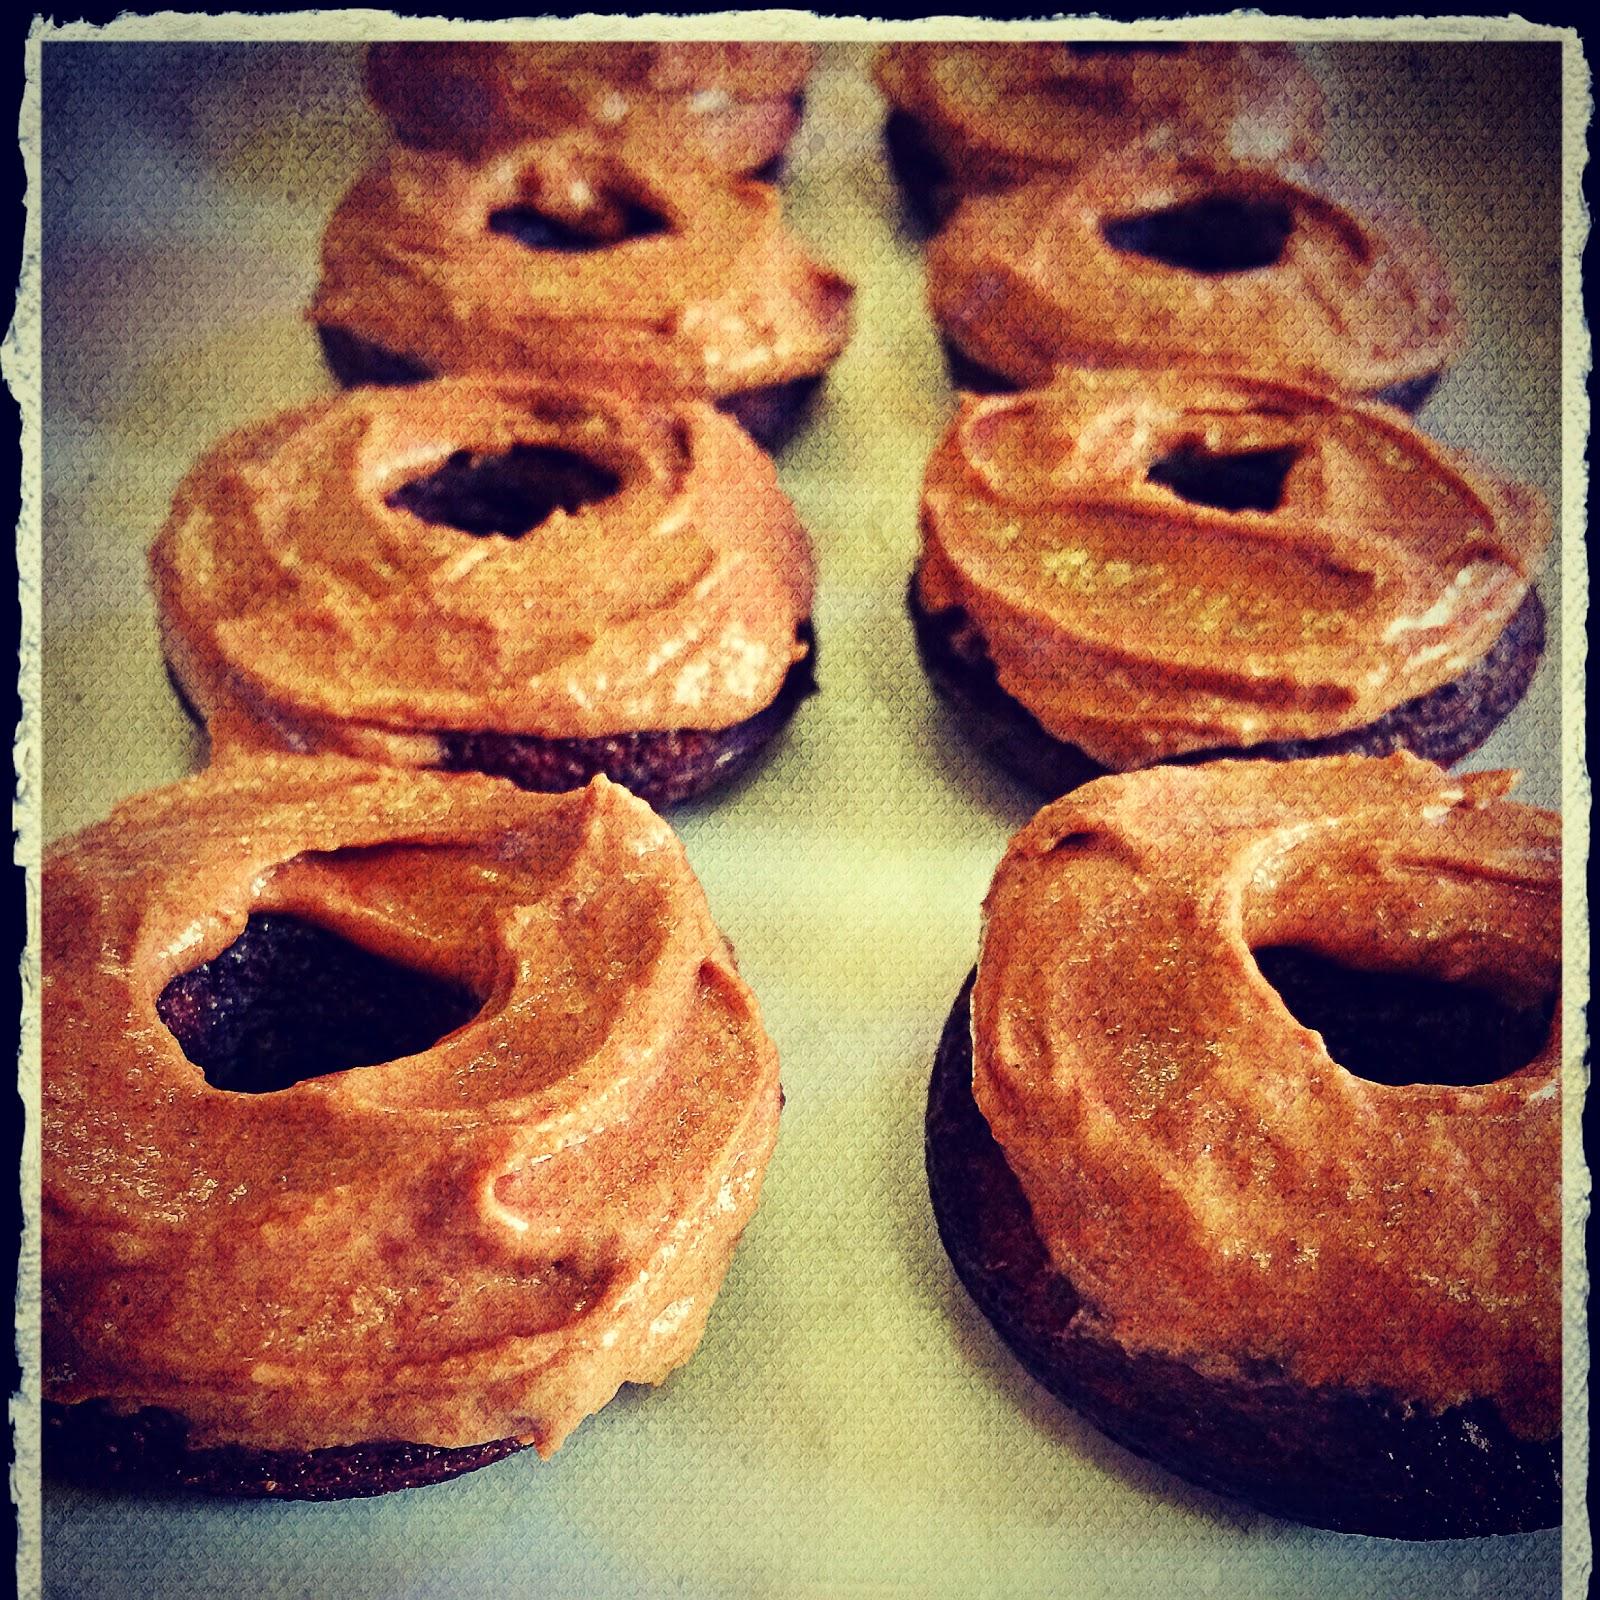 iced choc donuts